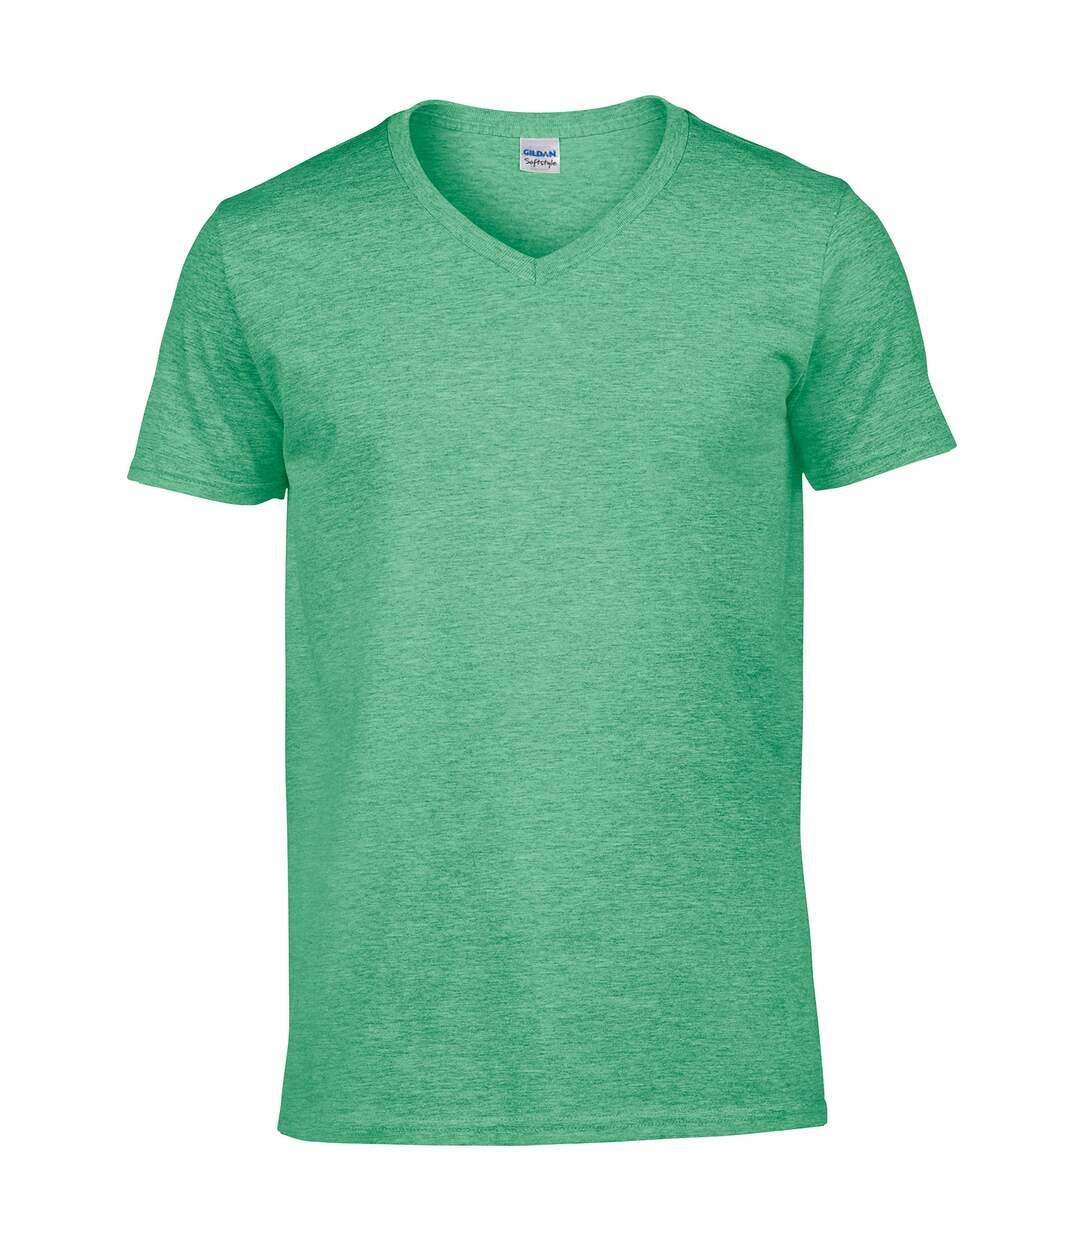 Gildan Mens Soft Style V-Neck Short Sleeve T-Shirt (Heather Irish Green) - UTBC490